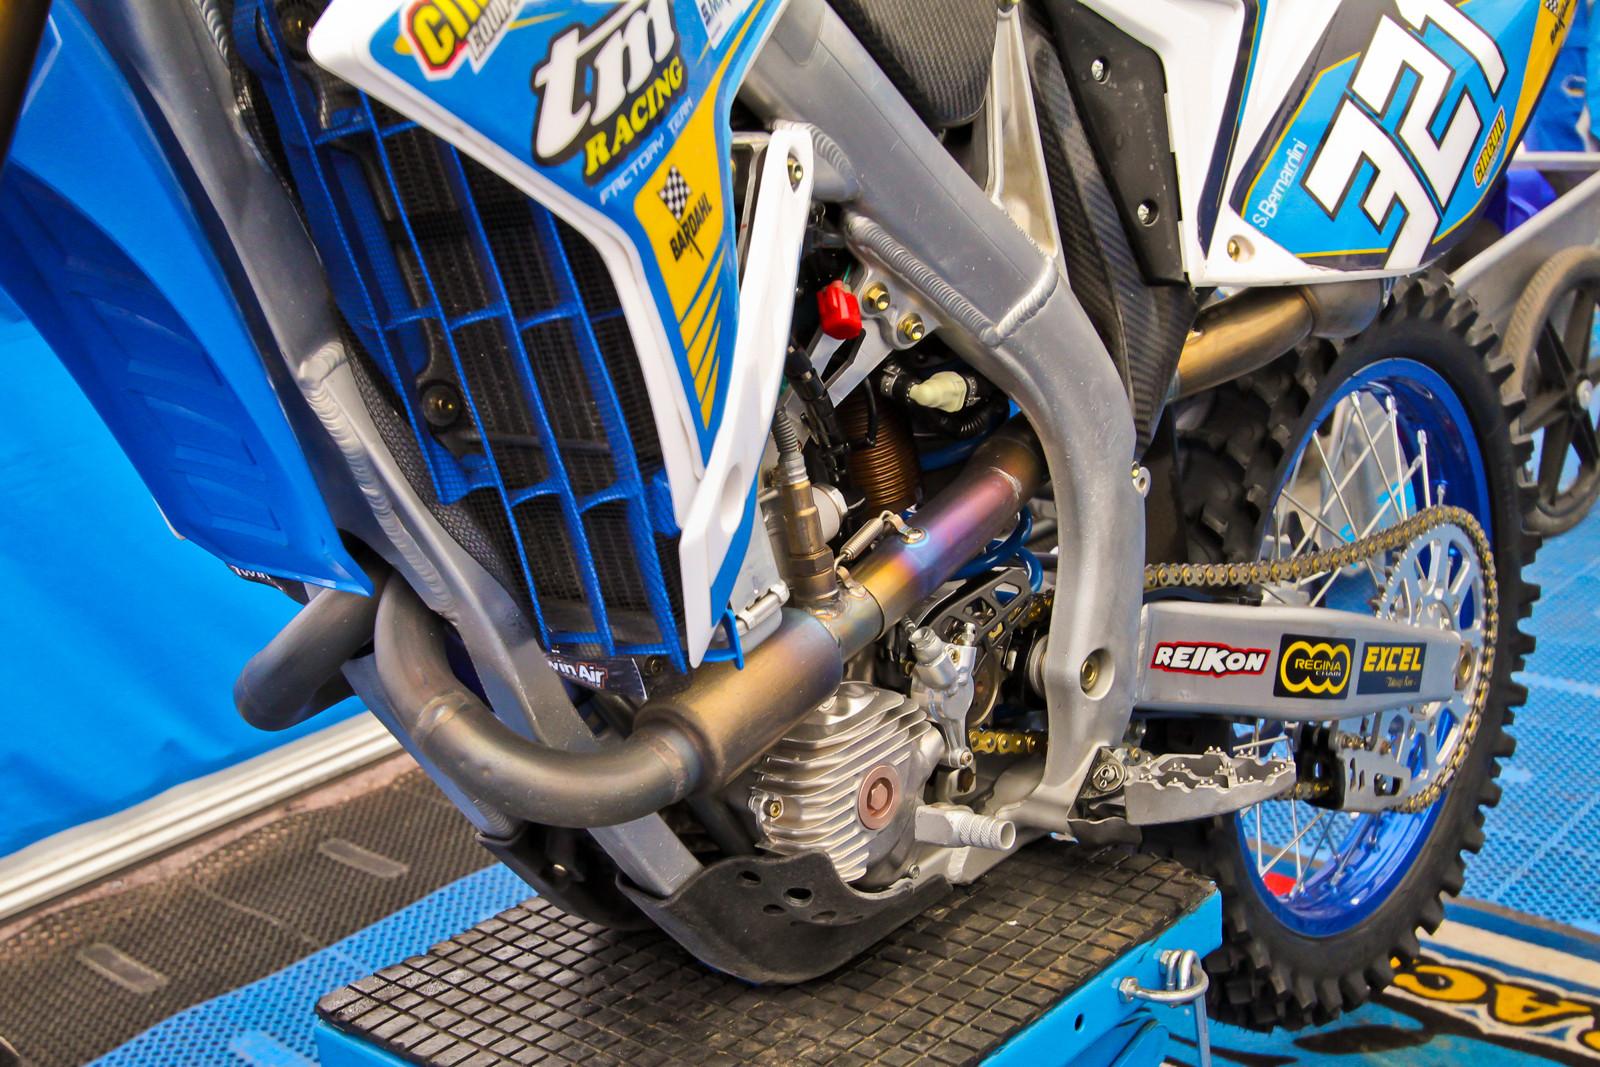 Samuel Bernardini's Factory TM 250 - Vital MX Pit Bits: 2017 MXGP of Valkenswaard - Motocross Pictures - Vital MX